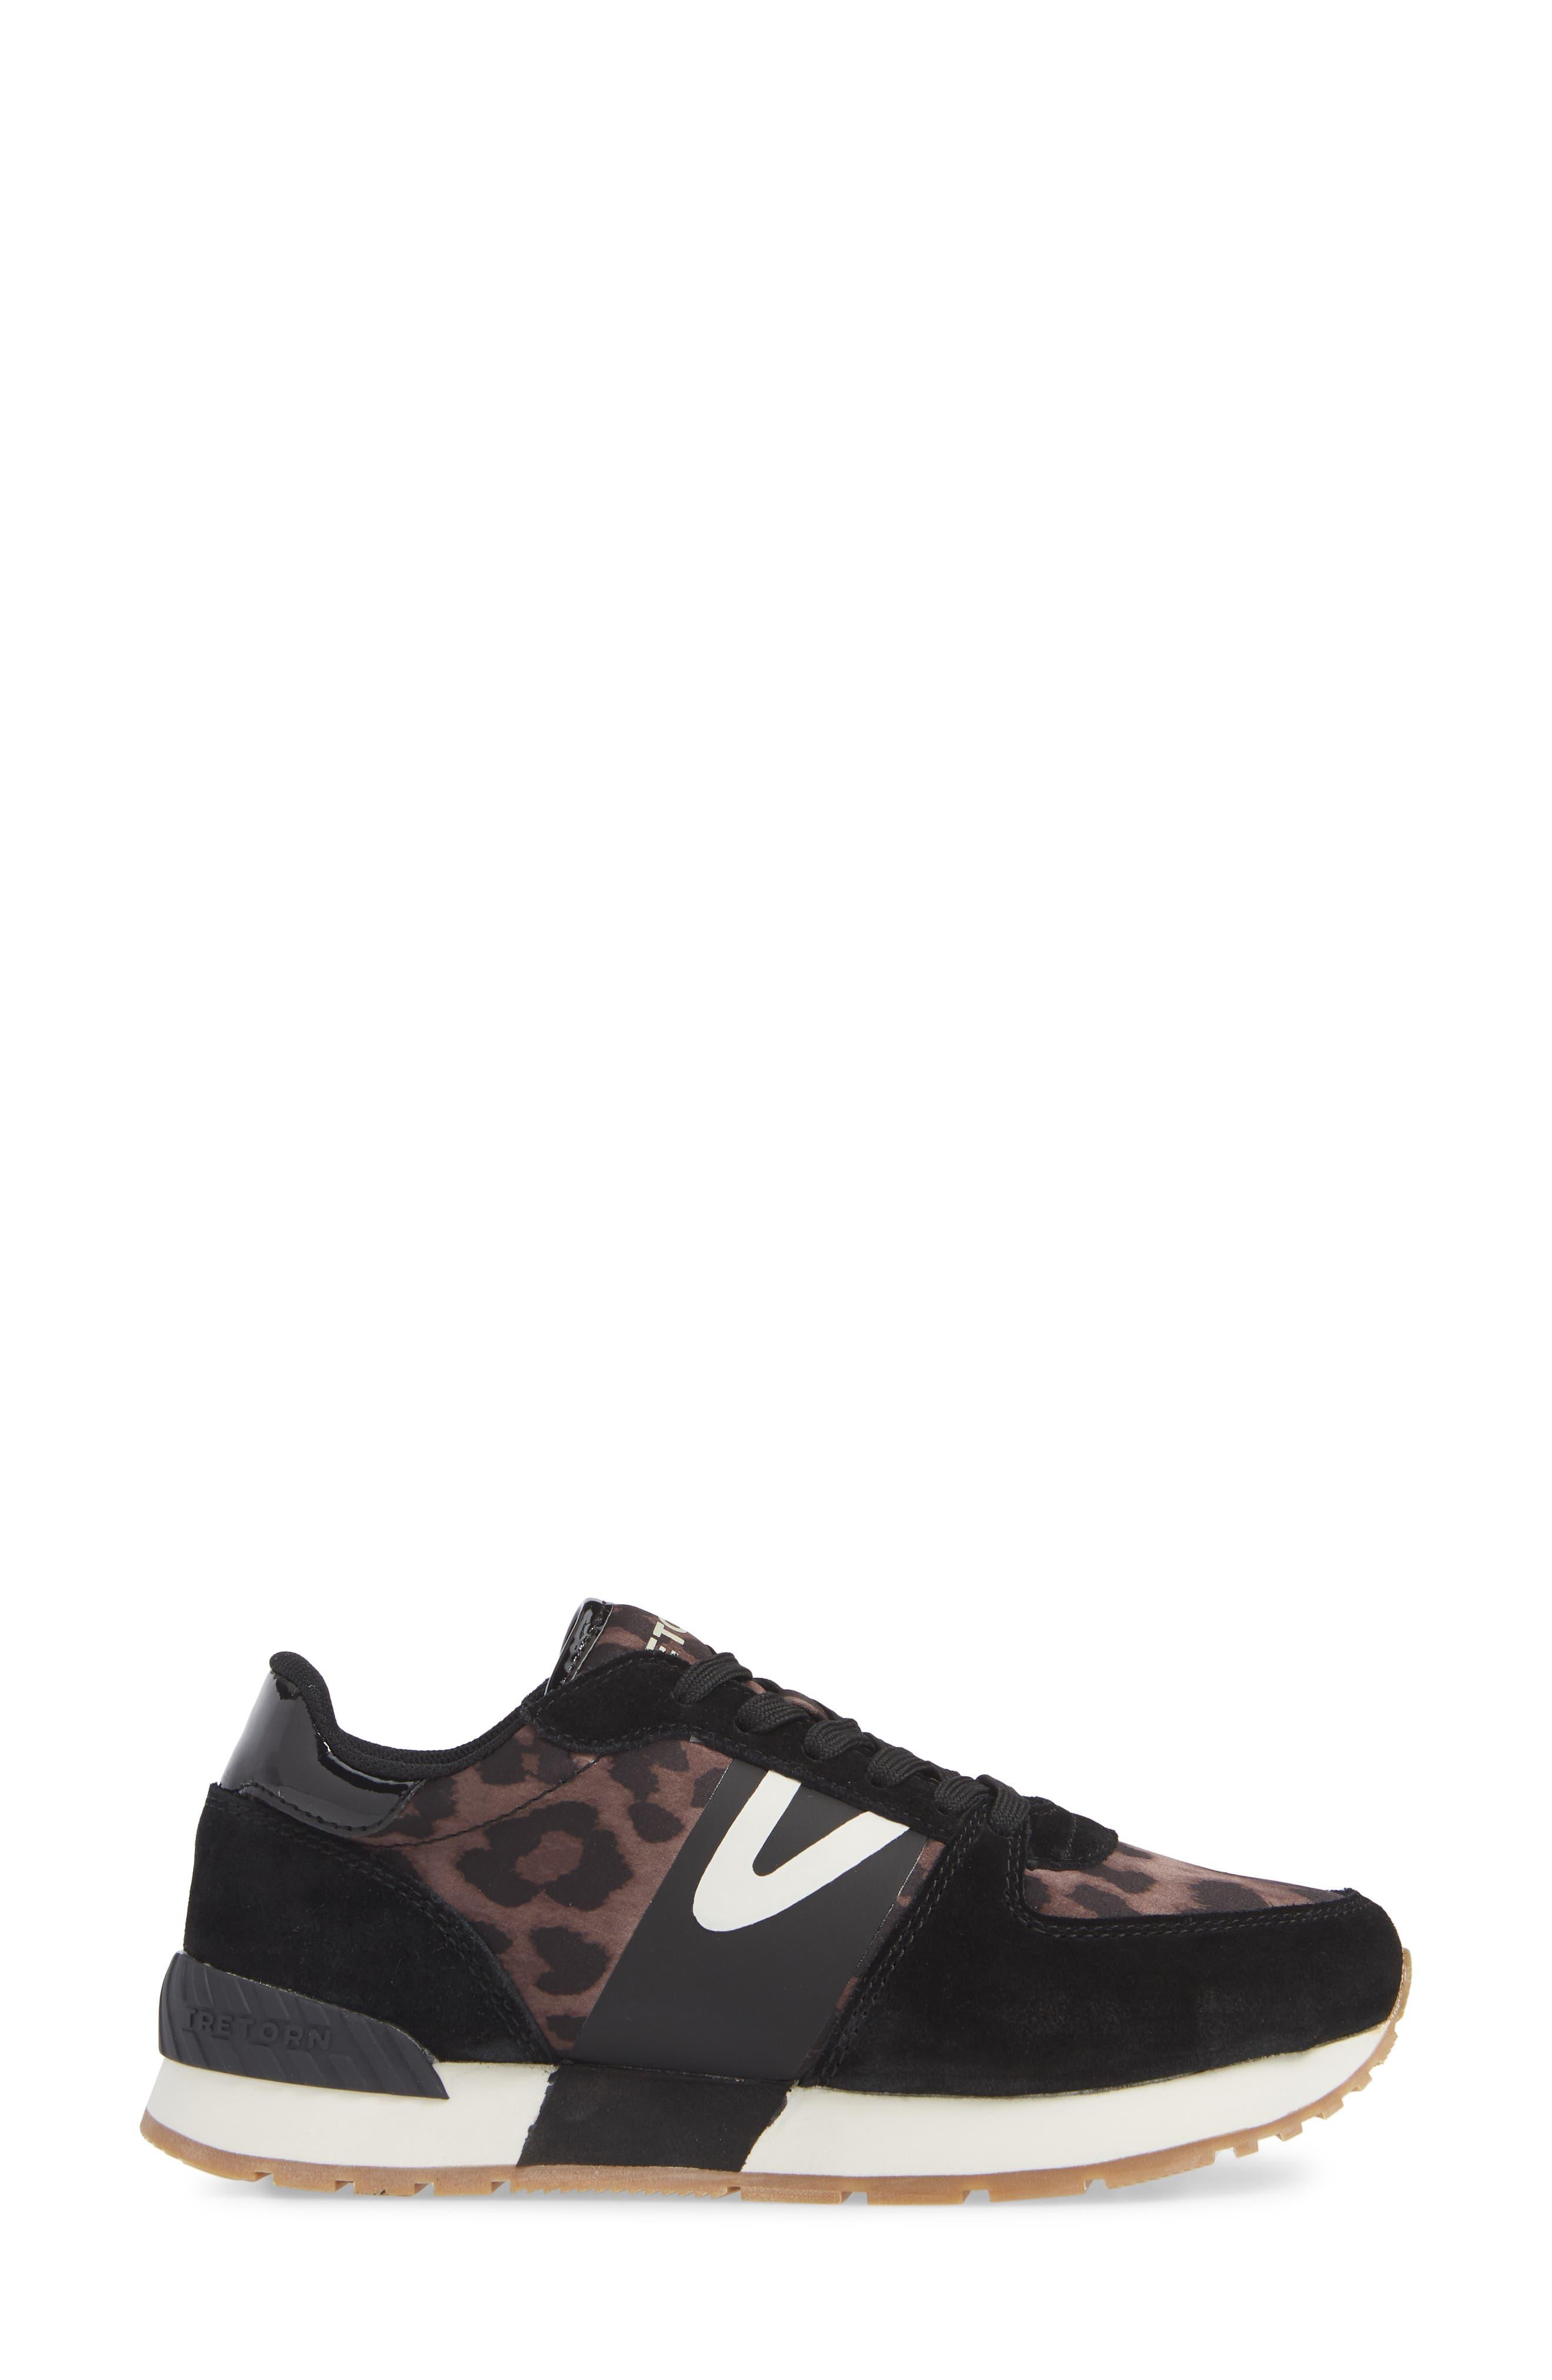 Loyola 9 Sneaker,                             Alternate thumbnail 3, color,                             002